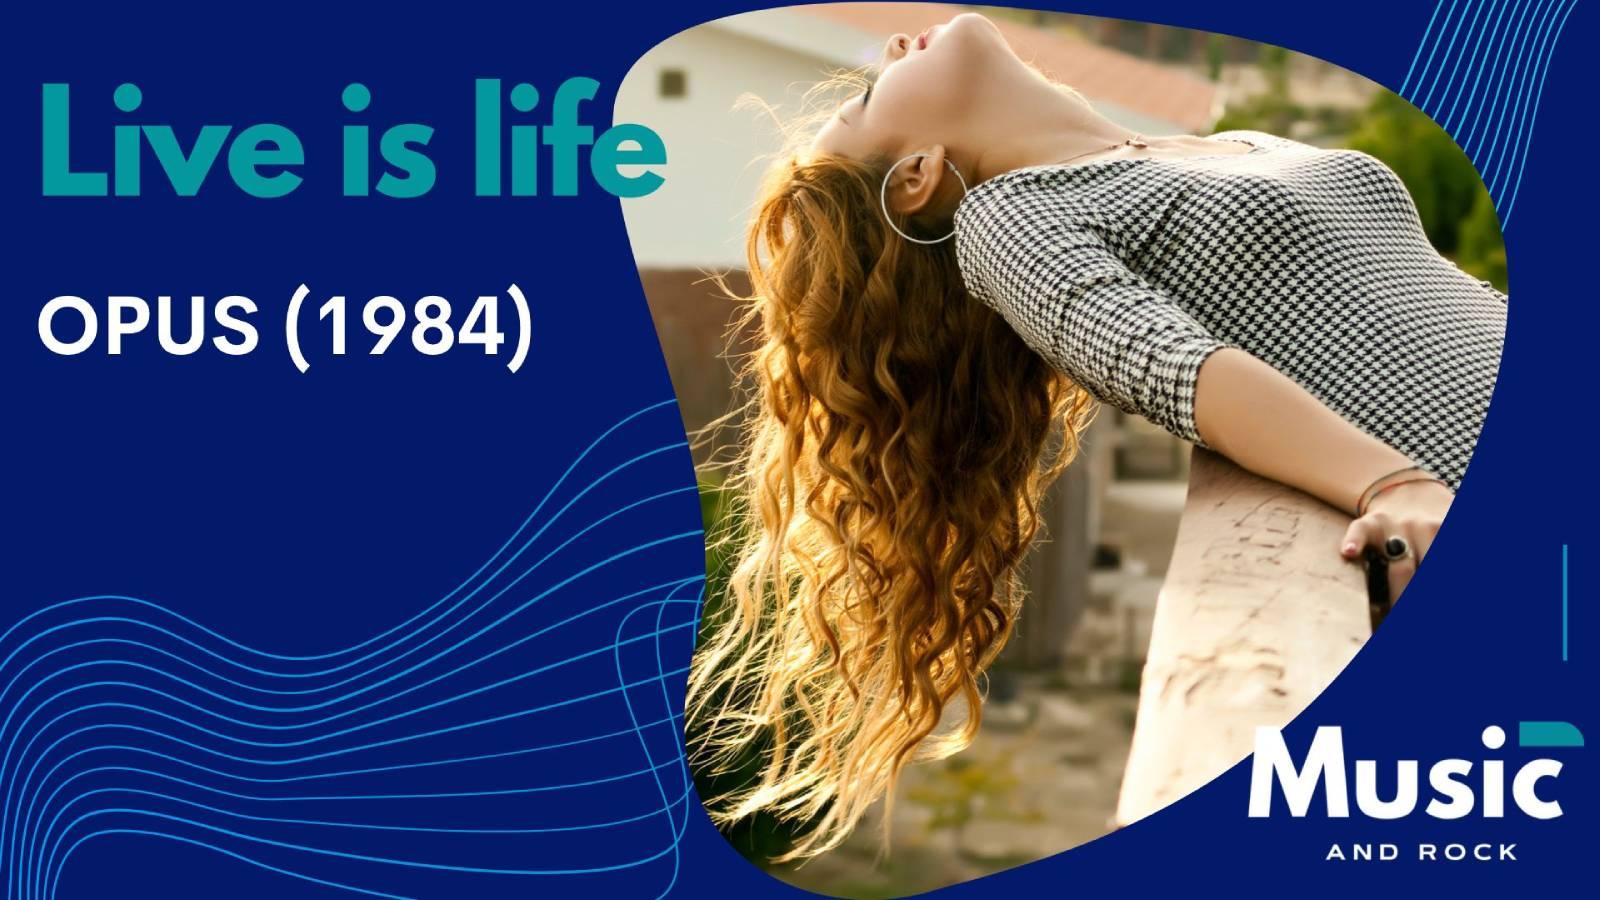 "En este momento estás viendo Live is life de Opus, la canción compuesta en Ibiza que ha inspirado una película para ochenteros<span class=""wtr-time-wrap after-title""><span class=""wtr-time-number"">6</span> minutos de lectura</span>"